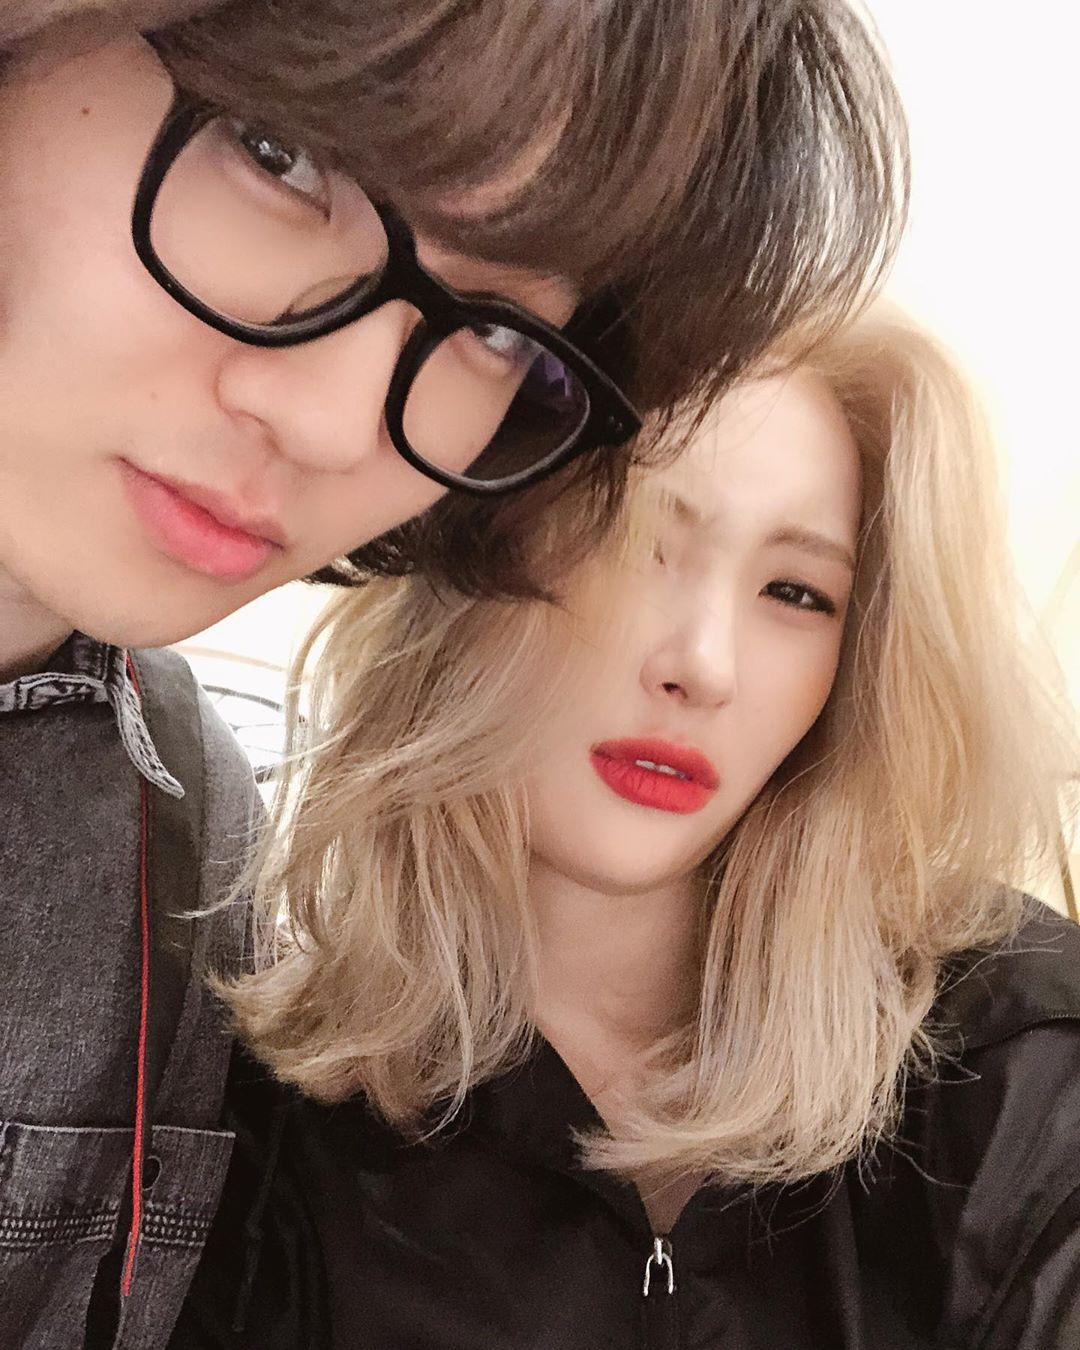 sunmi brother 2019 3